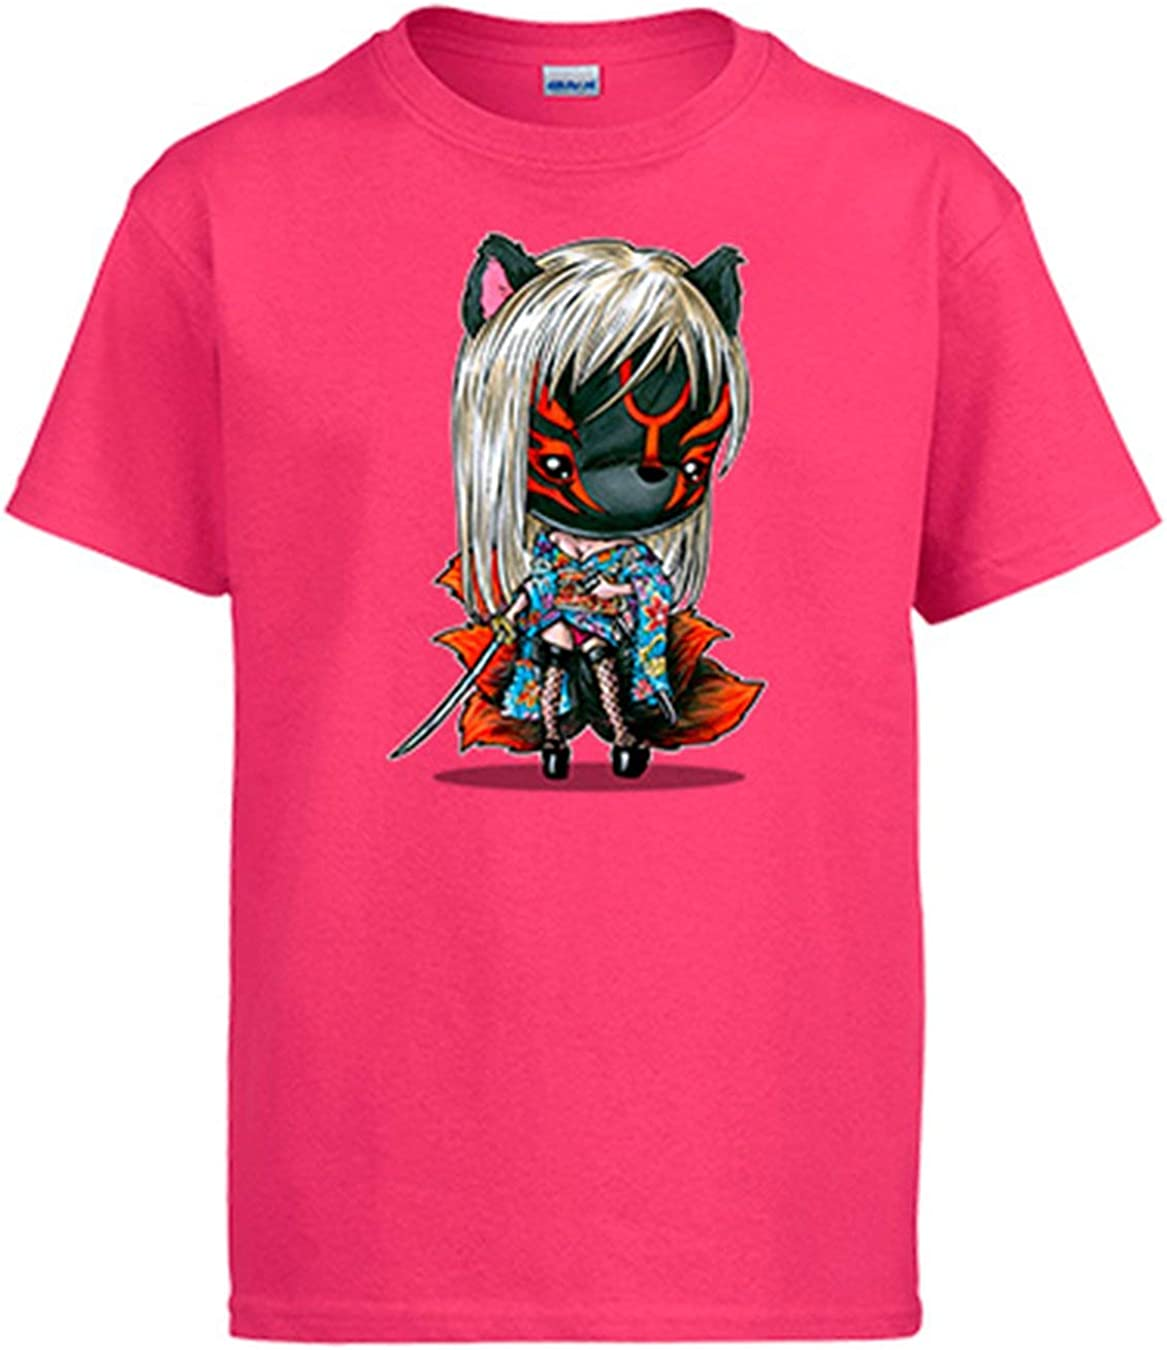 Diver Bebé Camiseta Chibi Kawaii Kitsune Version 2 Parodia de los Yokai Japoneses